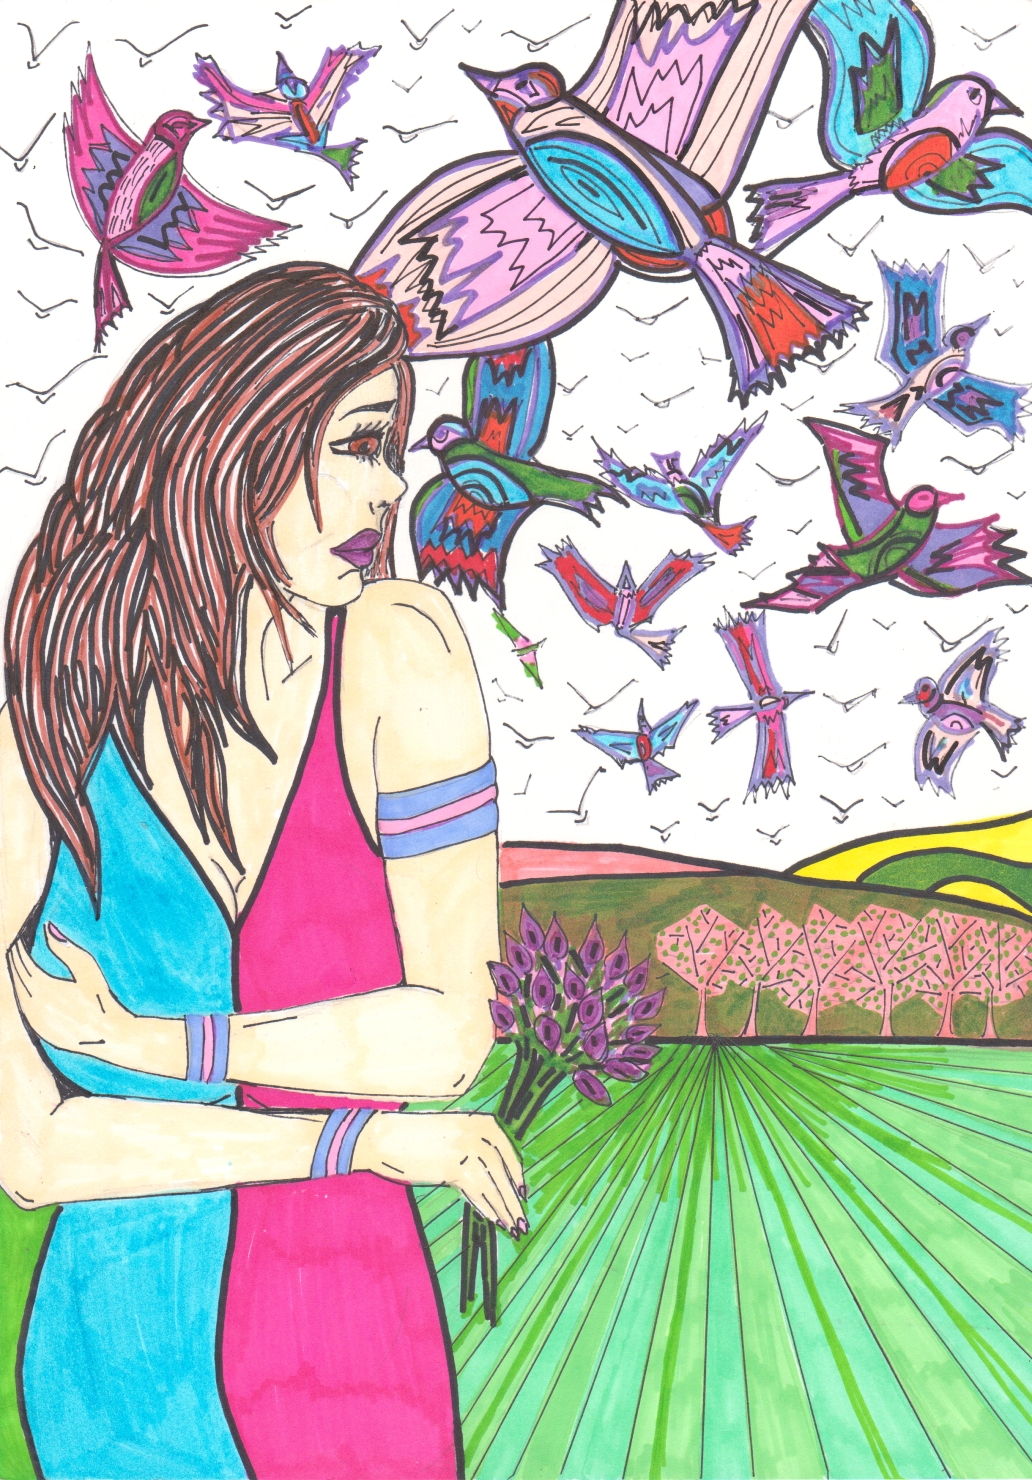 Waiting - By Charlotte Farhan